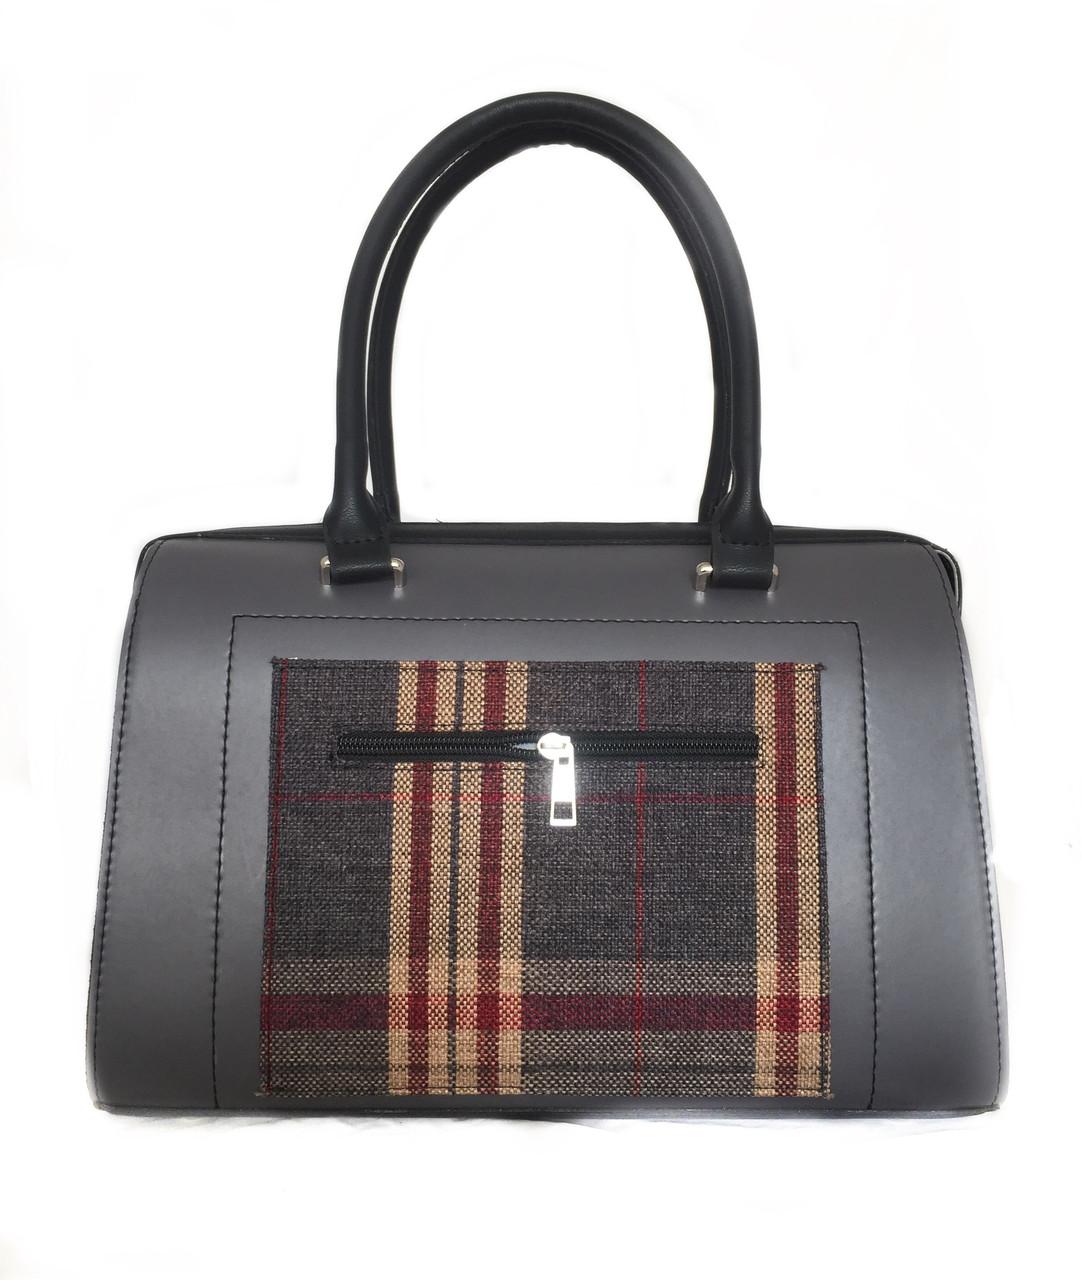 Женская сумка из экокожи Betty Pretty разноцветная 812P43015383SHTL